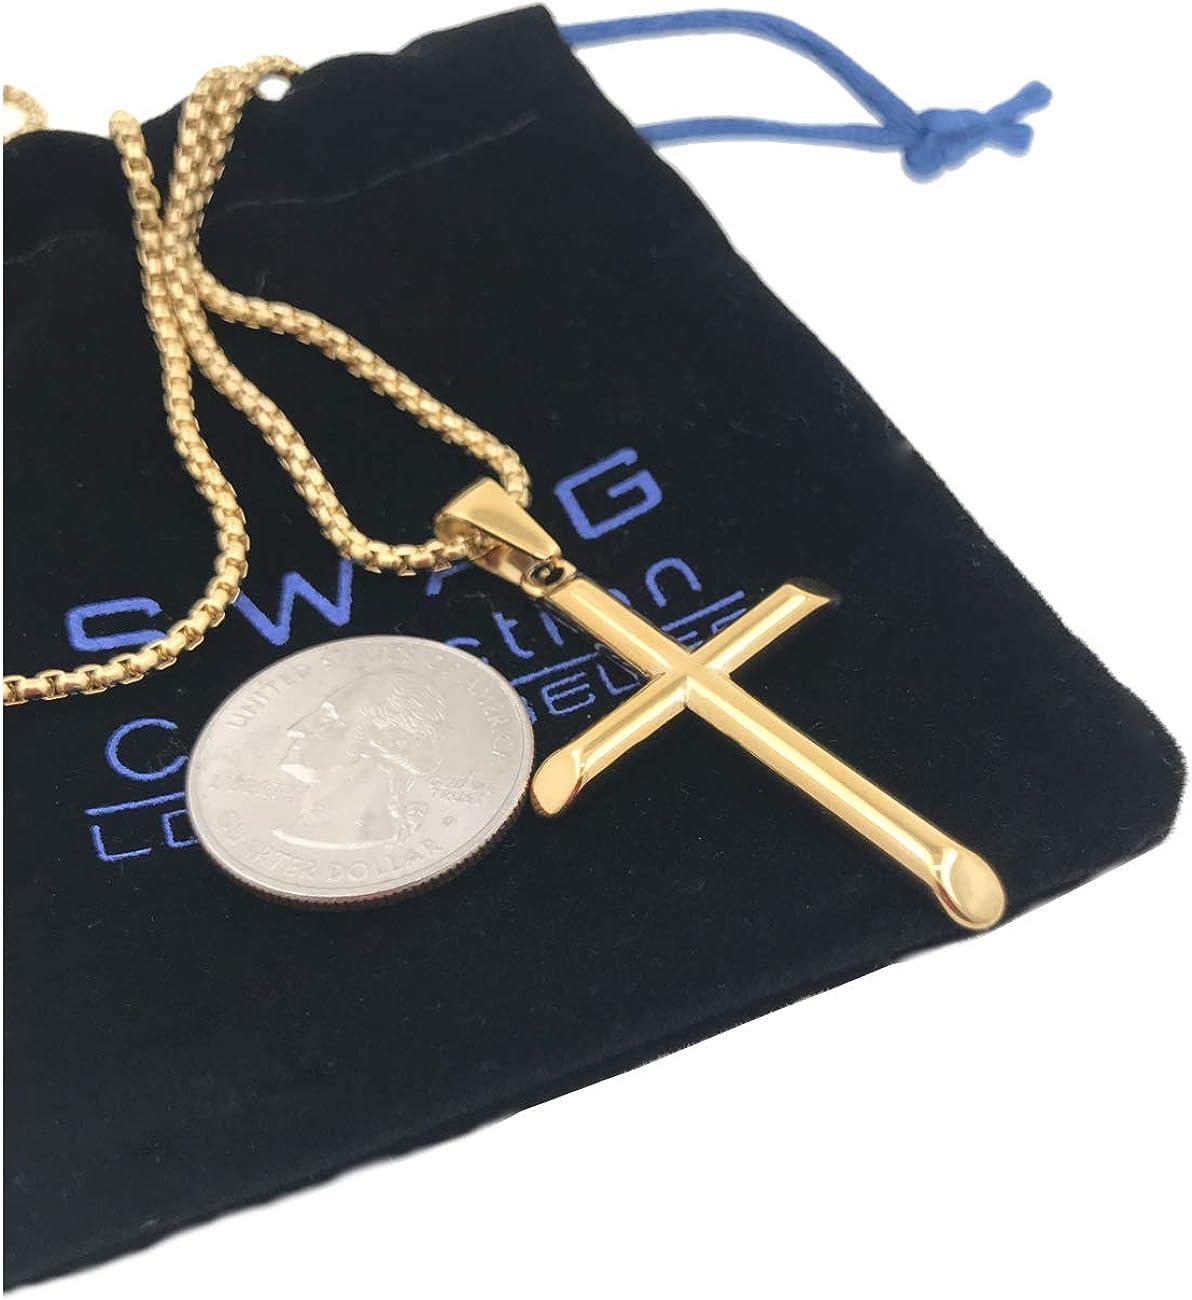 "100 80 60 40 20 0 Swag Collection Los Angeles Stay auf obere Gold Cross Crucifix und Necklace, 14 Kt (Karat) Gold Filled Overlay mit ein 22\"" Chain (Inch) Beautiful Jesus Cross Usa Made!"